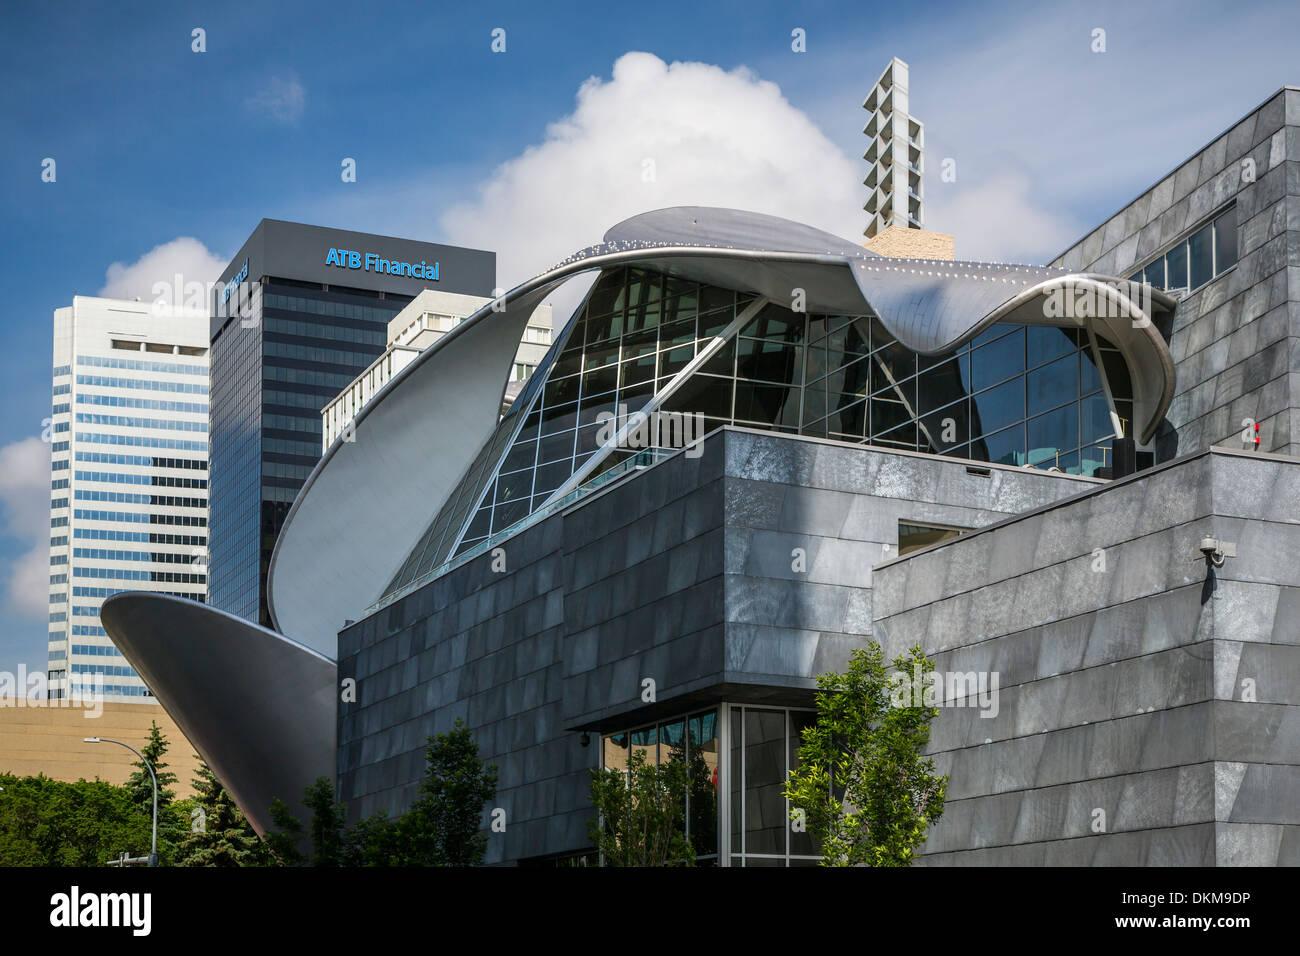 Exterior Design Art architectural design of the art gallery building exterior in stock